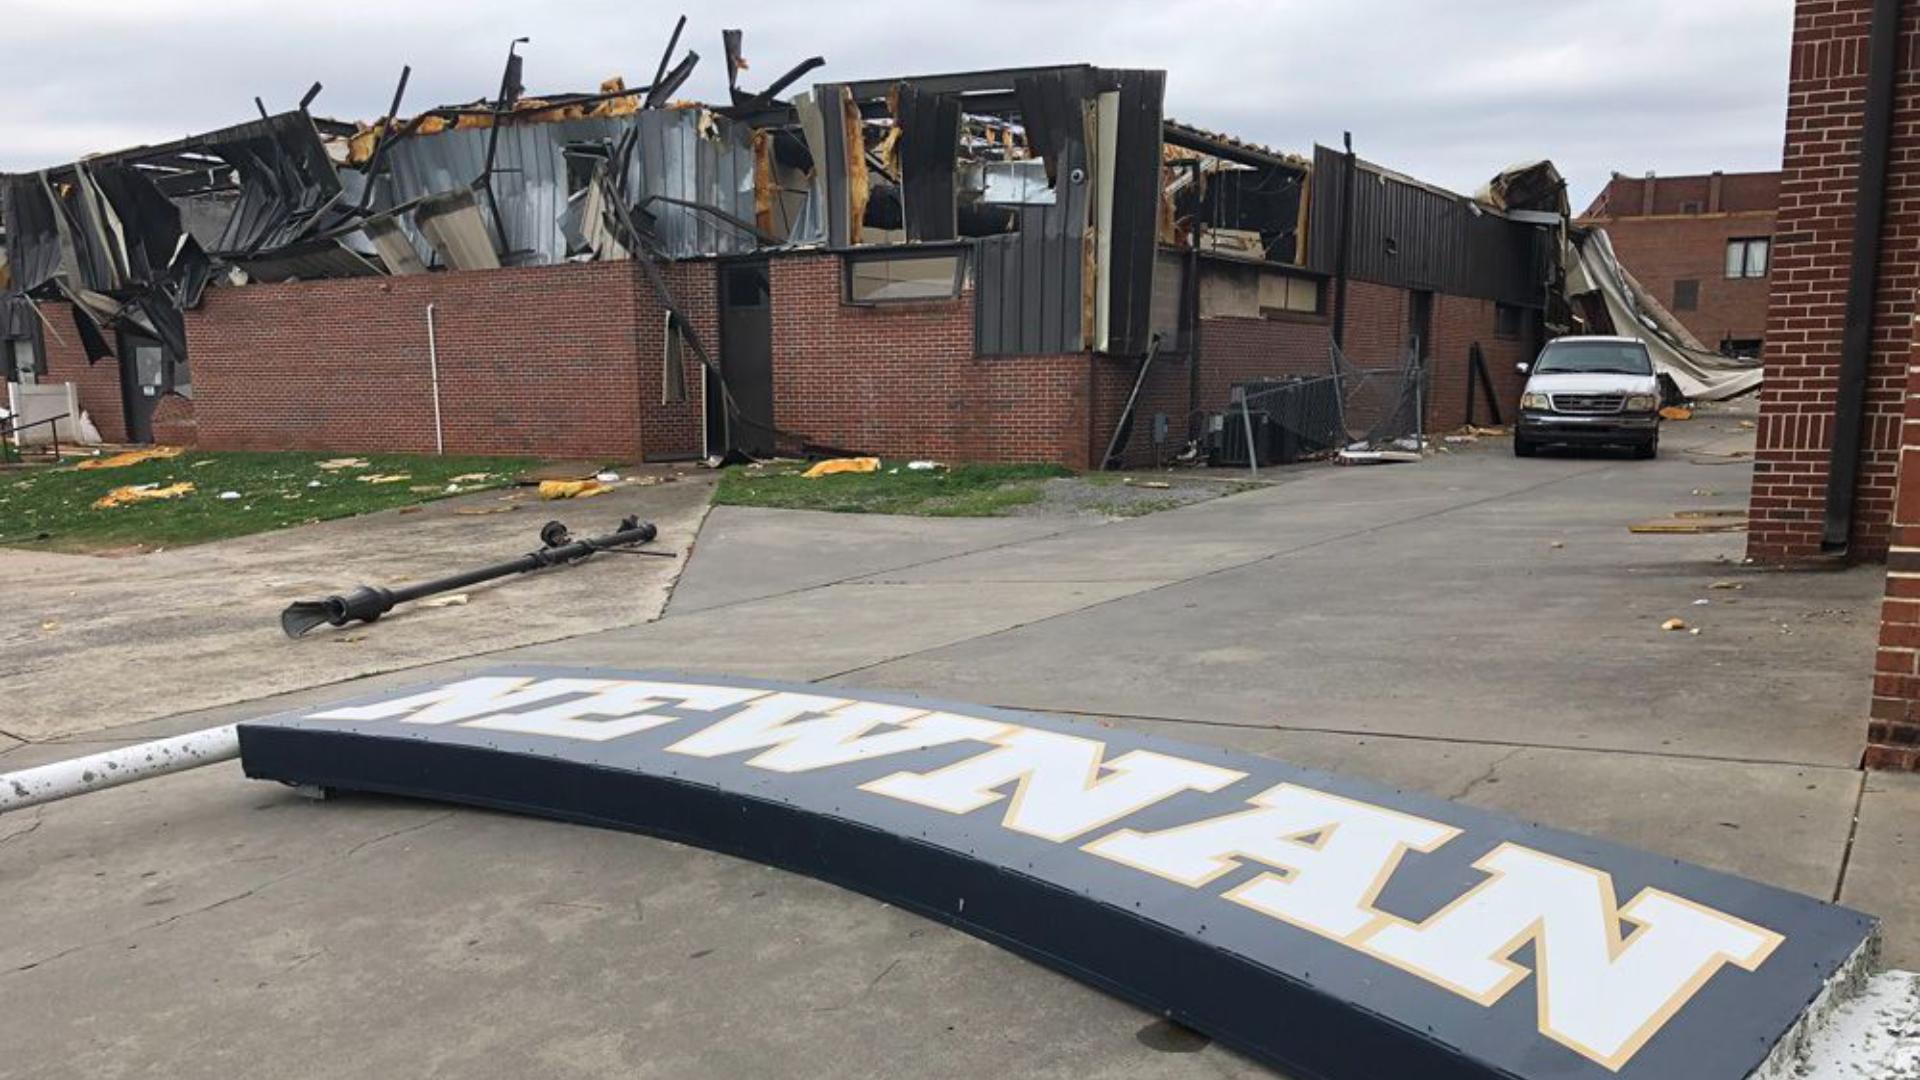 Falcons QB Matt Ryan surprises Newnan football with $25,000 donation to rebuild after tornado